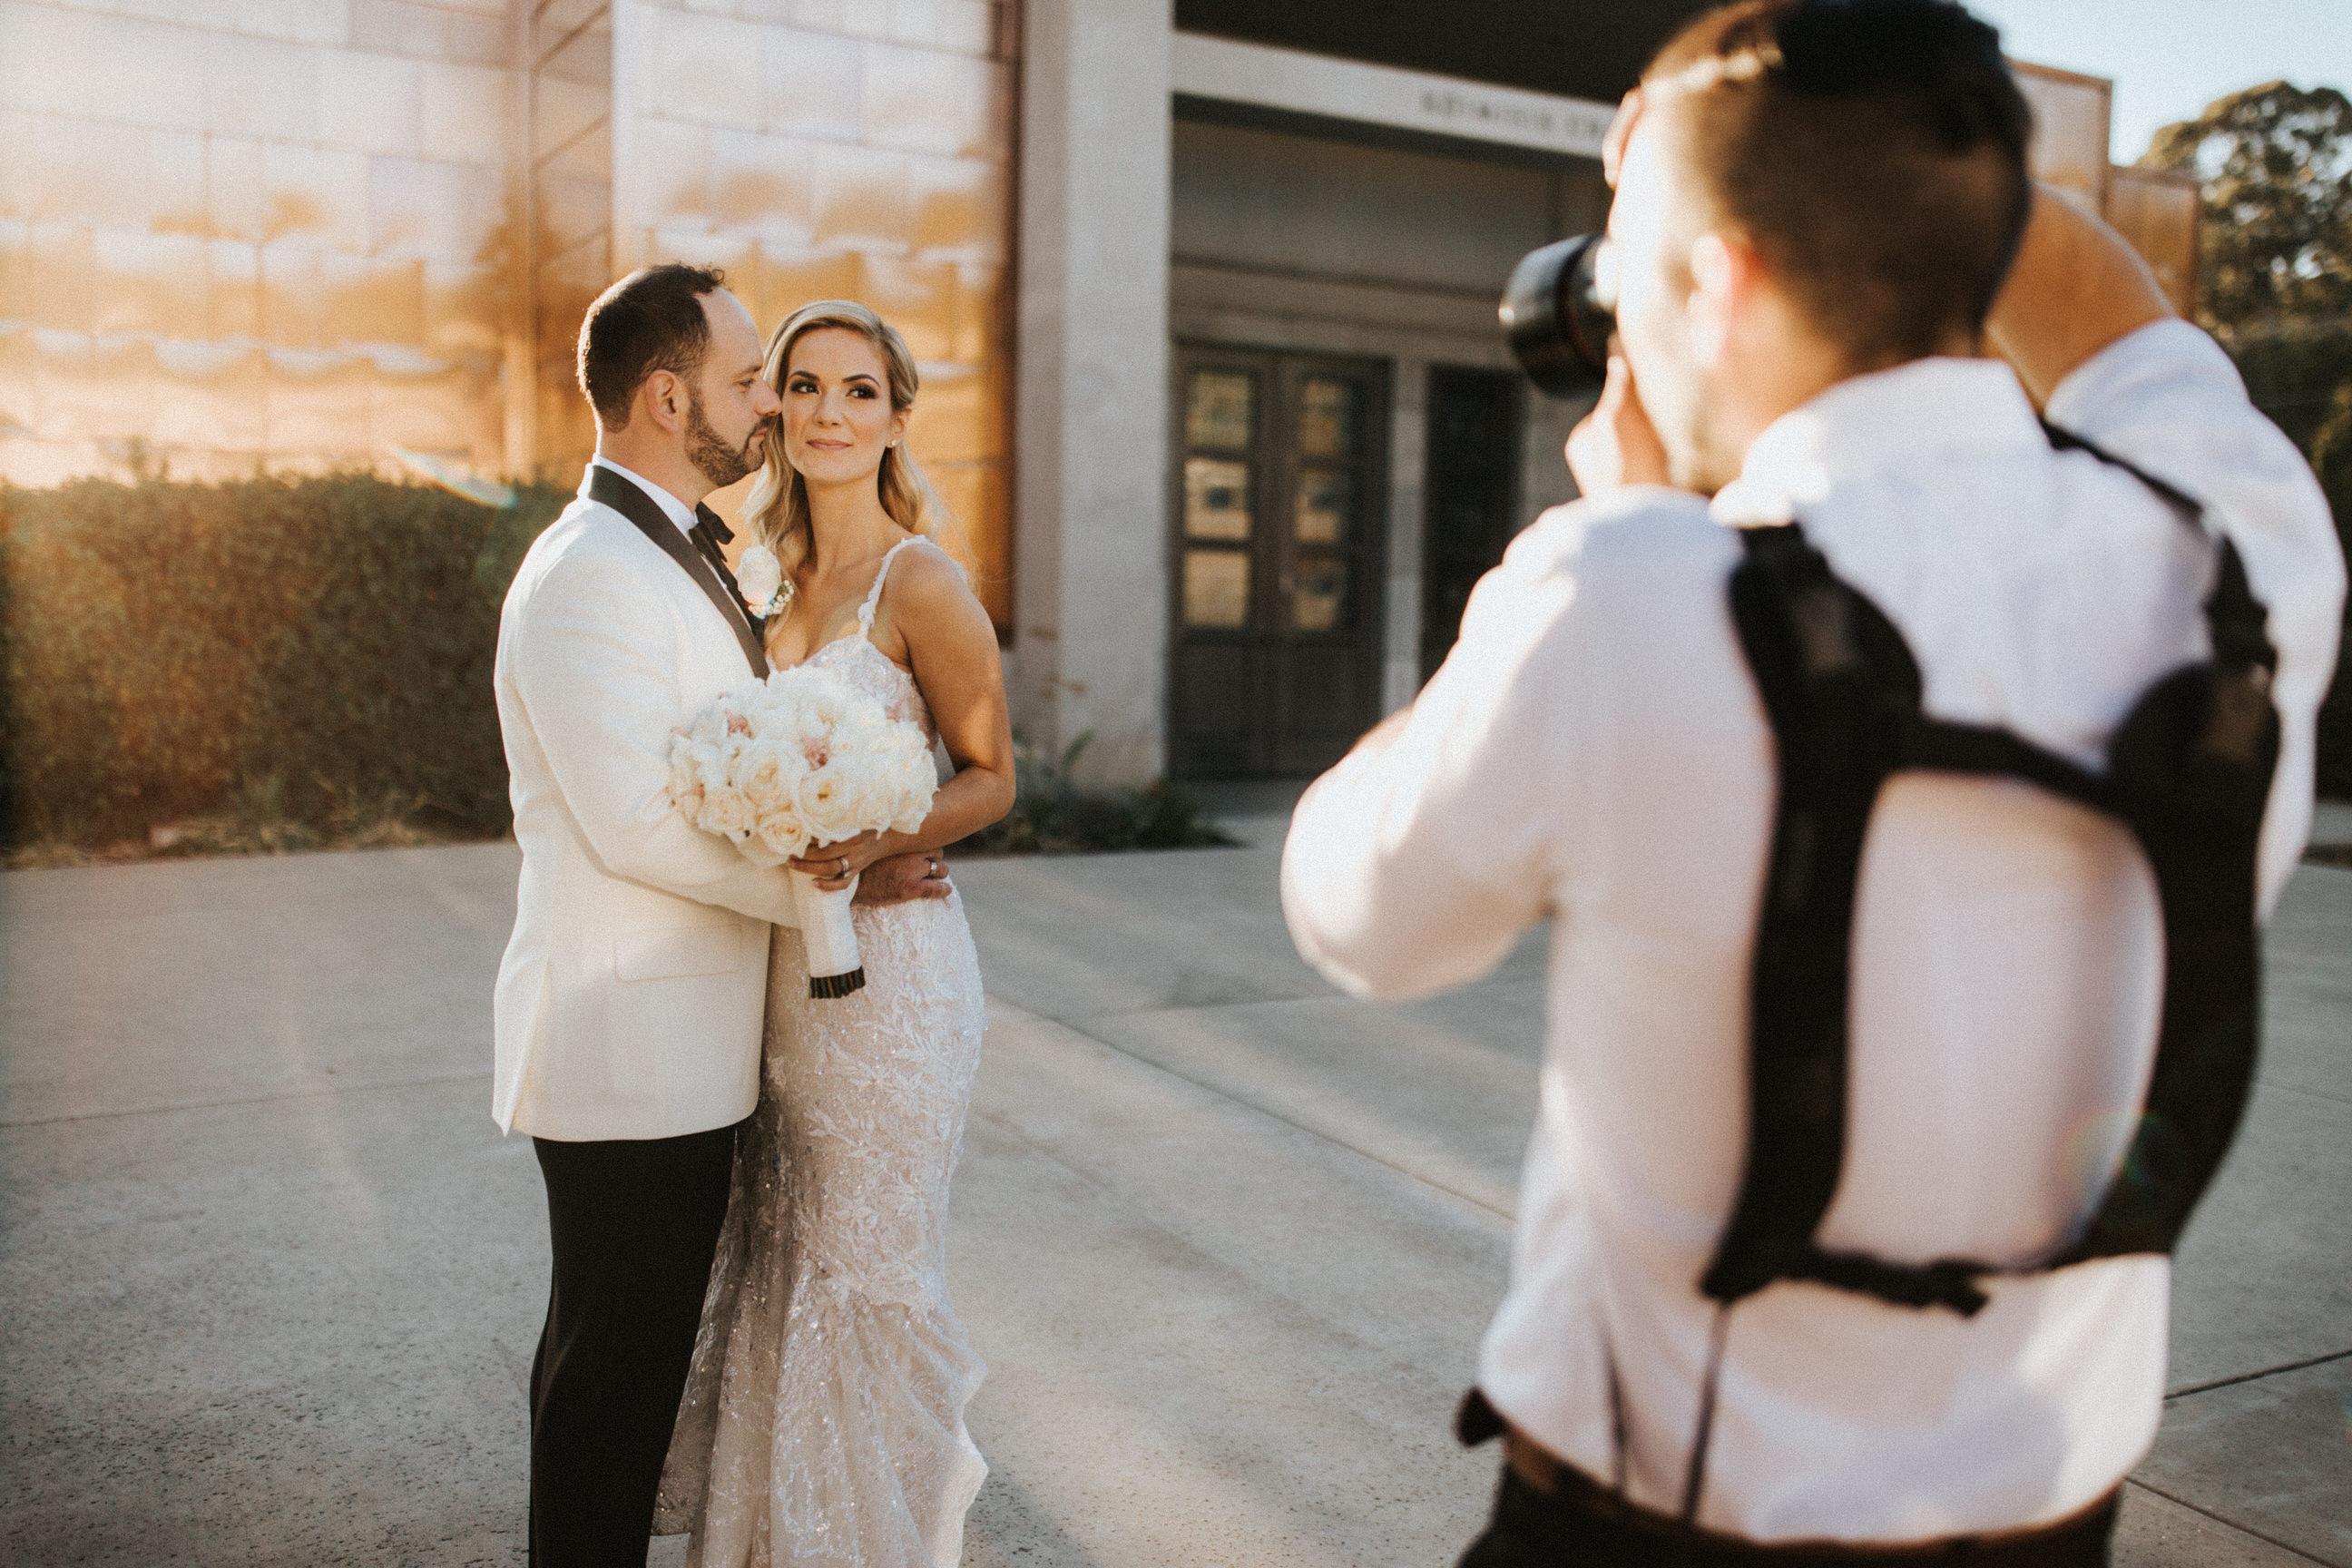 Wiley Putnam San Francisco wedding photographer